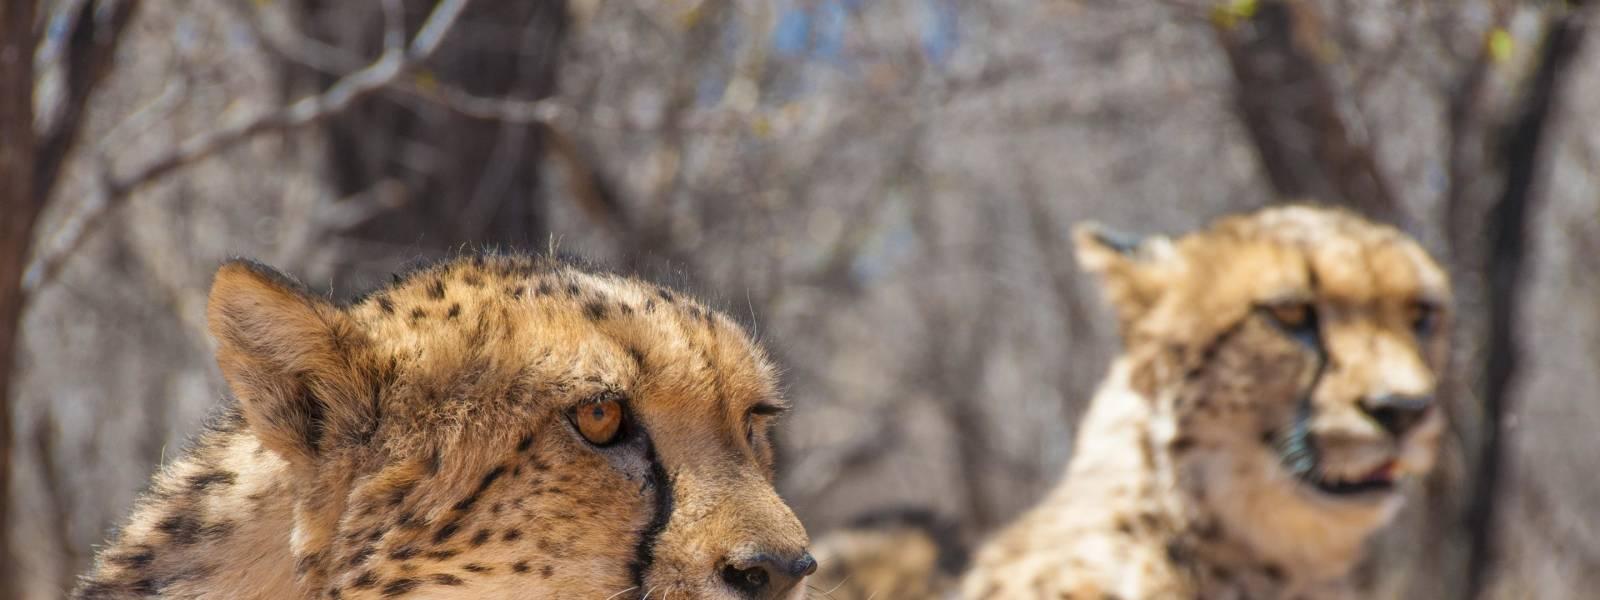 Cheetahs in Namibia